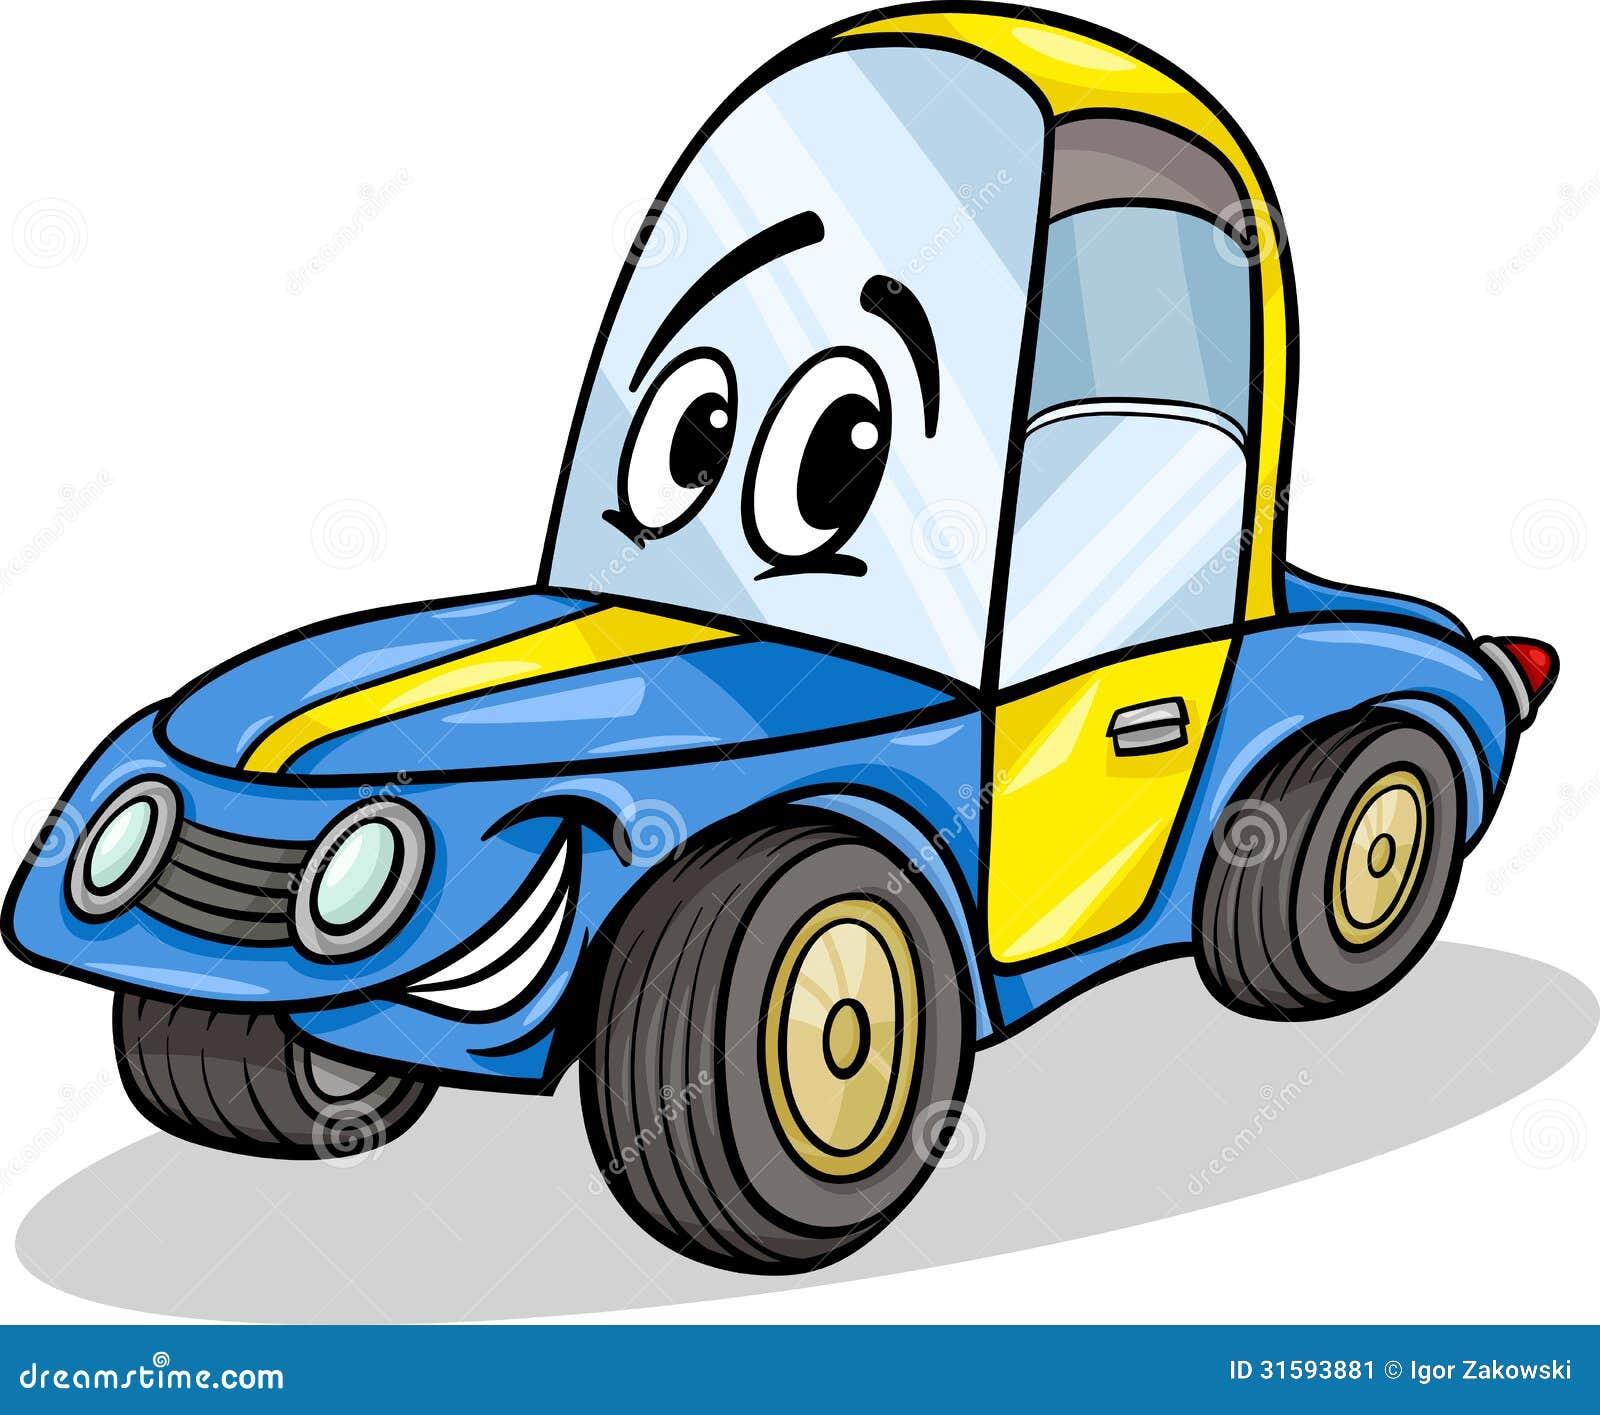 funny racing car cartoon illustration stock image image. Black Bedroom Furniture Sets. Home Design Ideas